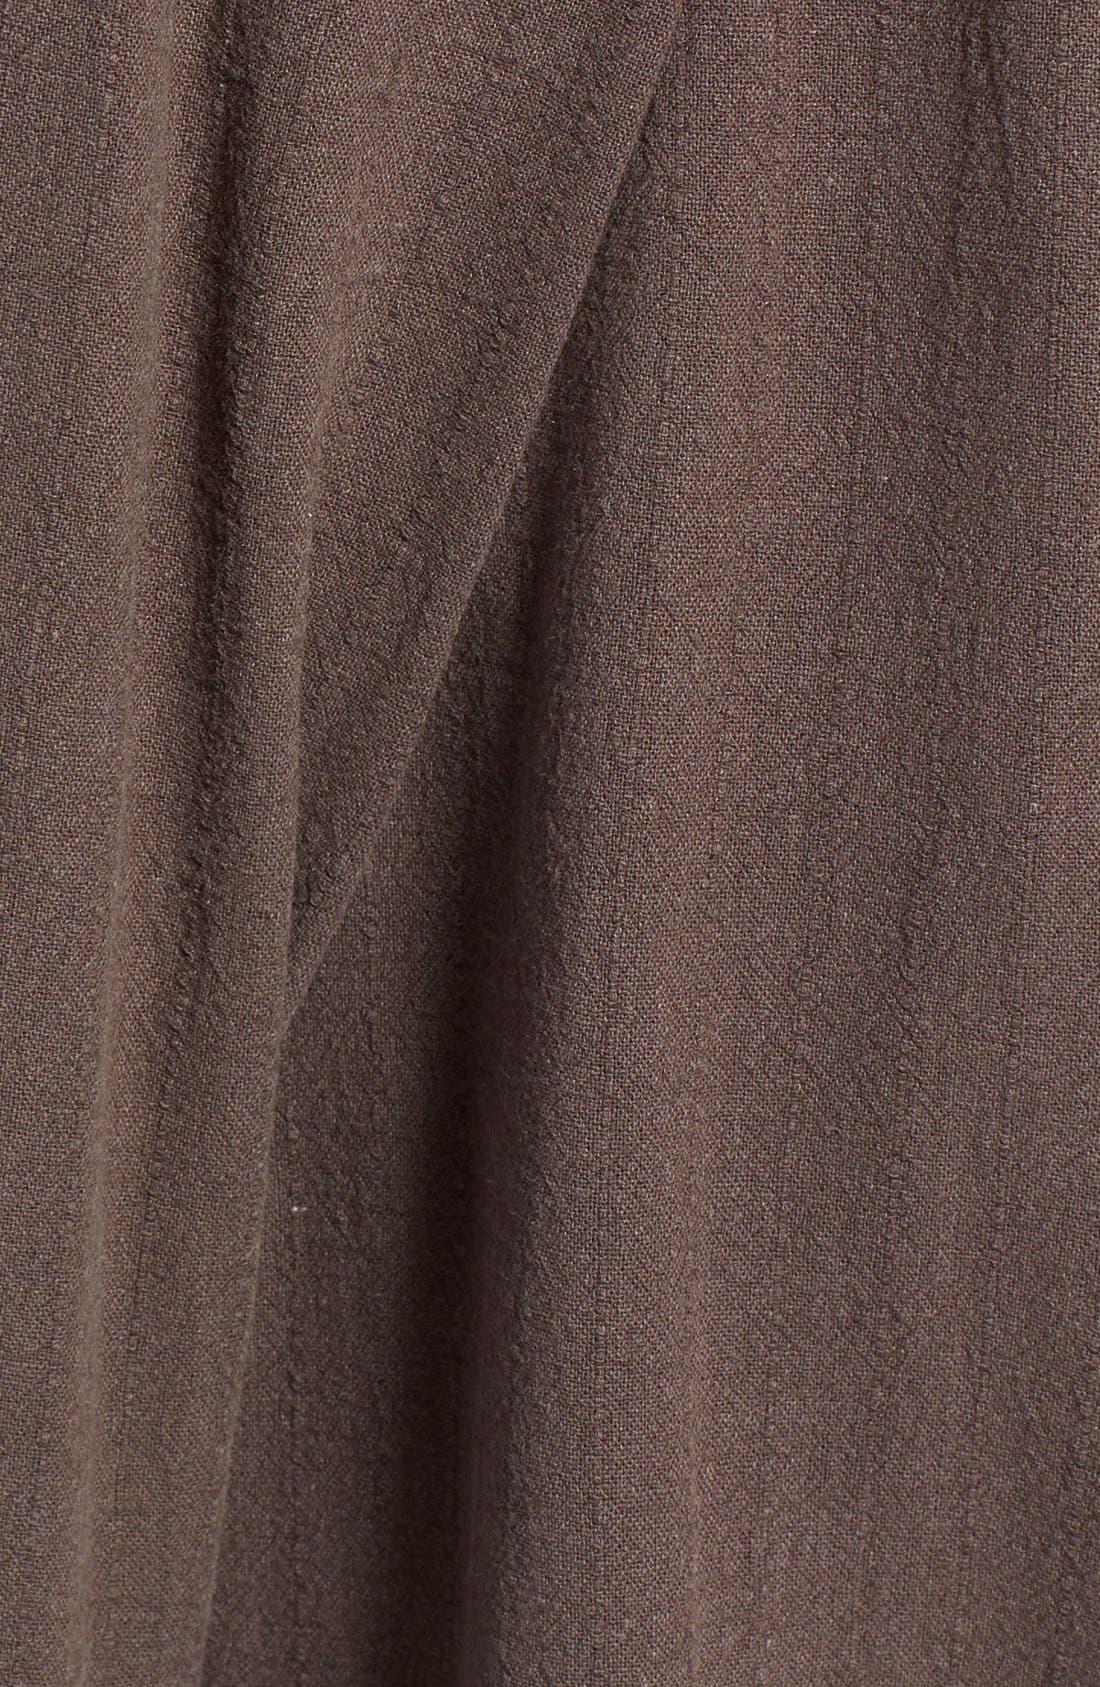 Alternate Image 4  - ASTR 'Peonia' Cotton & Linen Surplice Jumpsuit